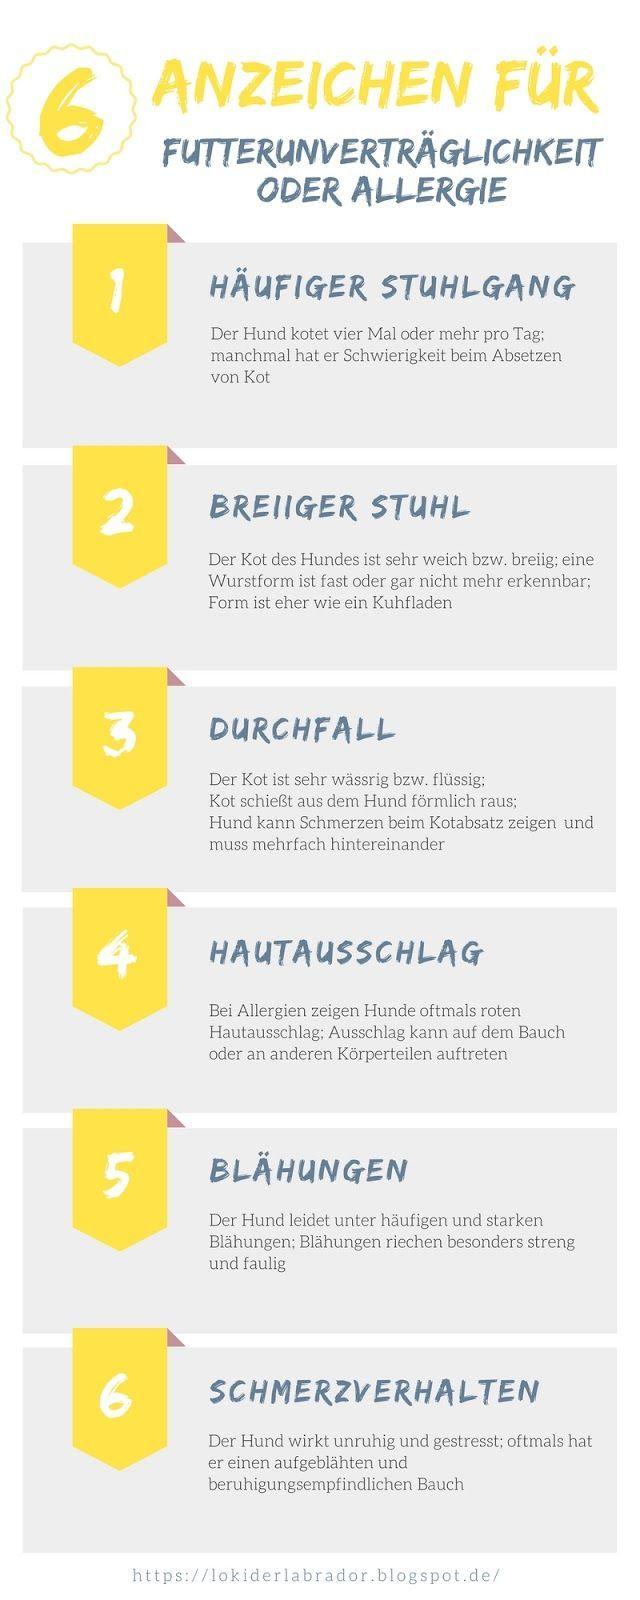 Futterumstellung 6 Anzeichen Fur Futterunvertraglichkeiten Infografik Hundeernahrung Hunde Ernahrung Hunde